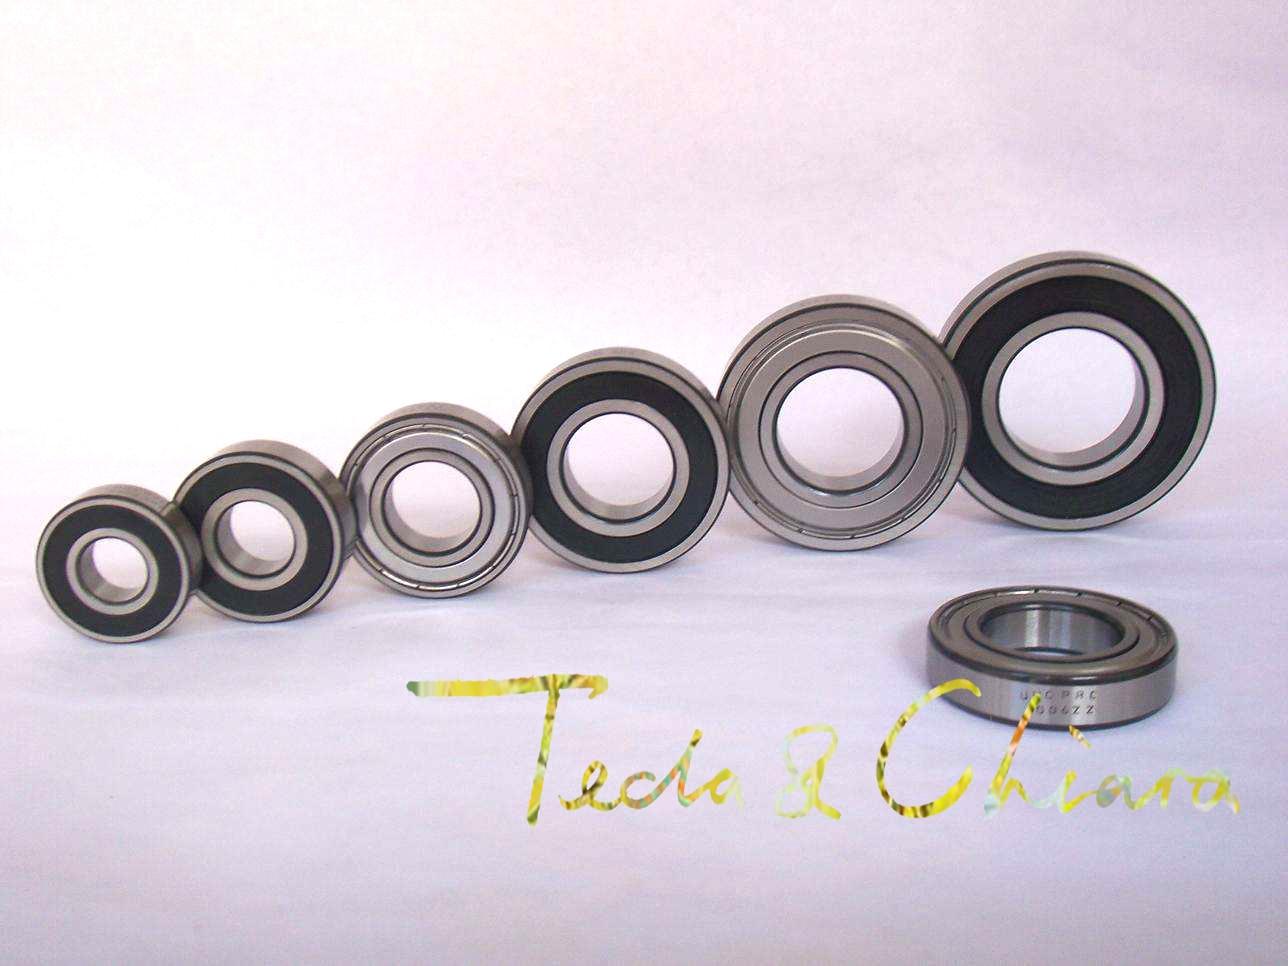 607 607ZZ 607RS 607-2Z 607Z 607-2RS ZZ RS RZ 2RZ Deep Groove Ball Bearings 7 X 19 X 6mm